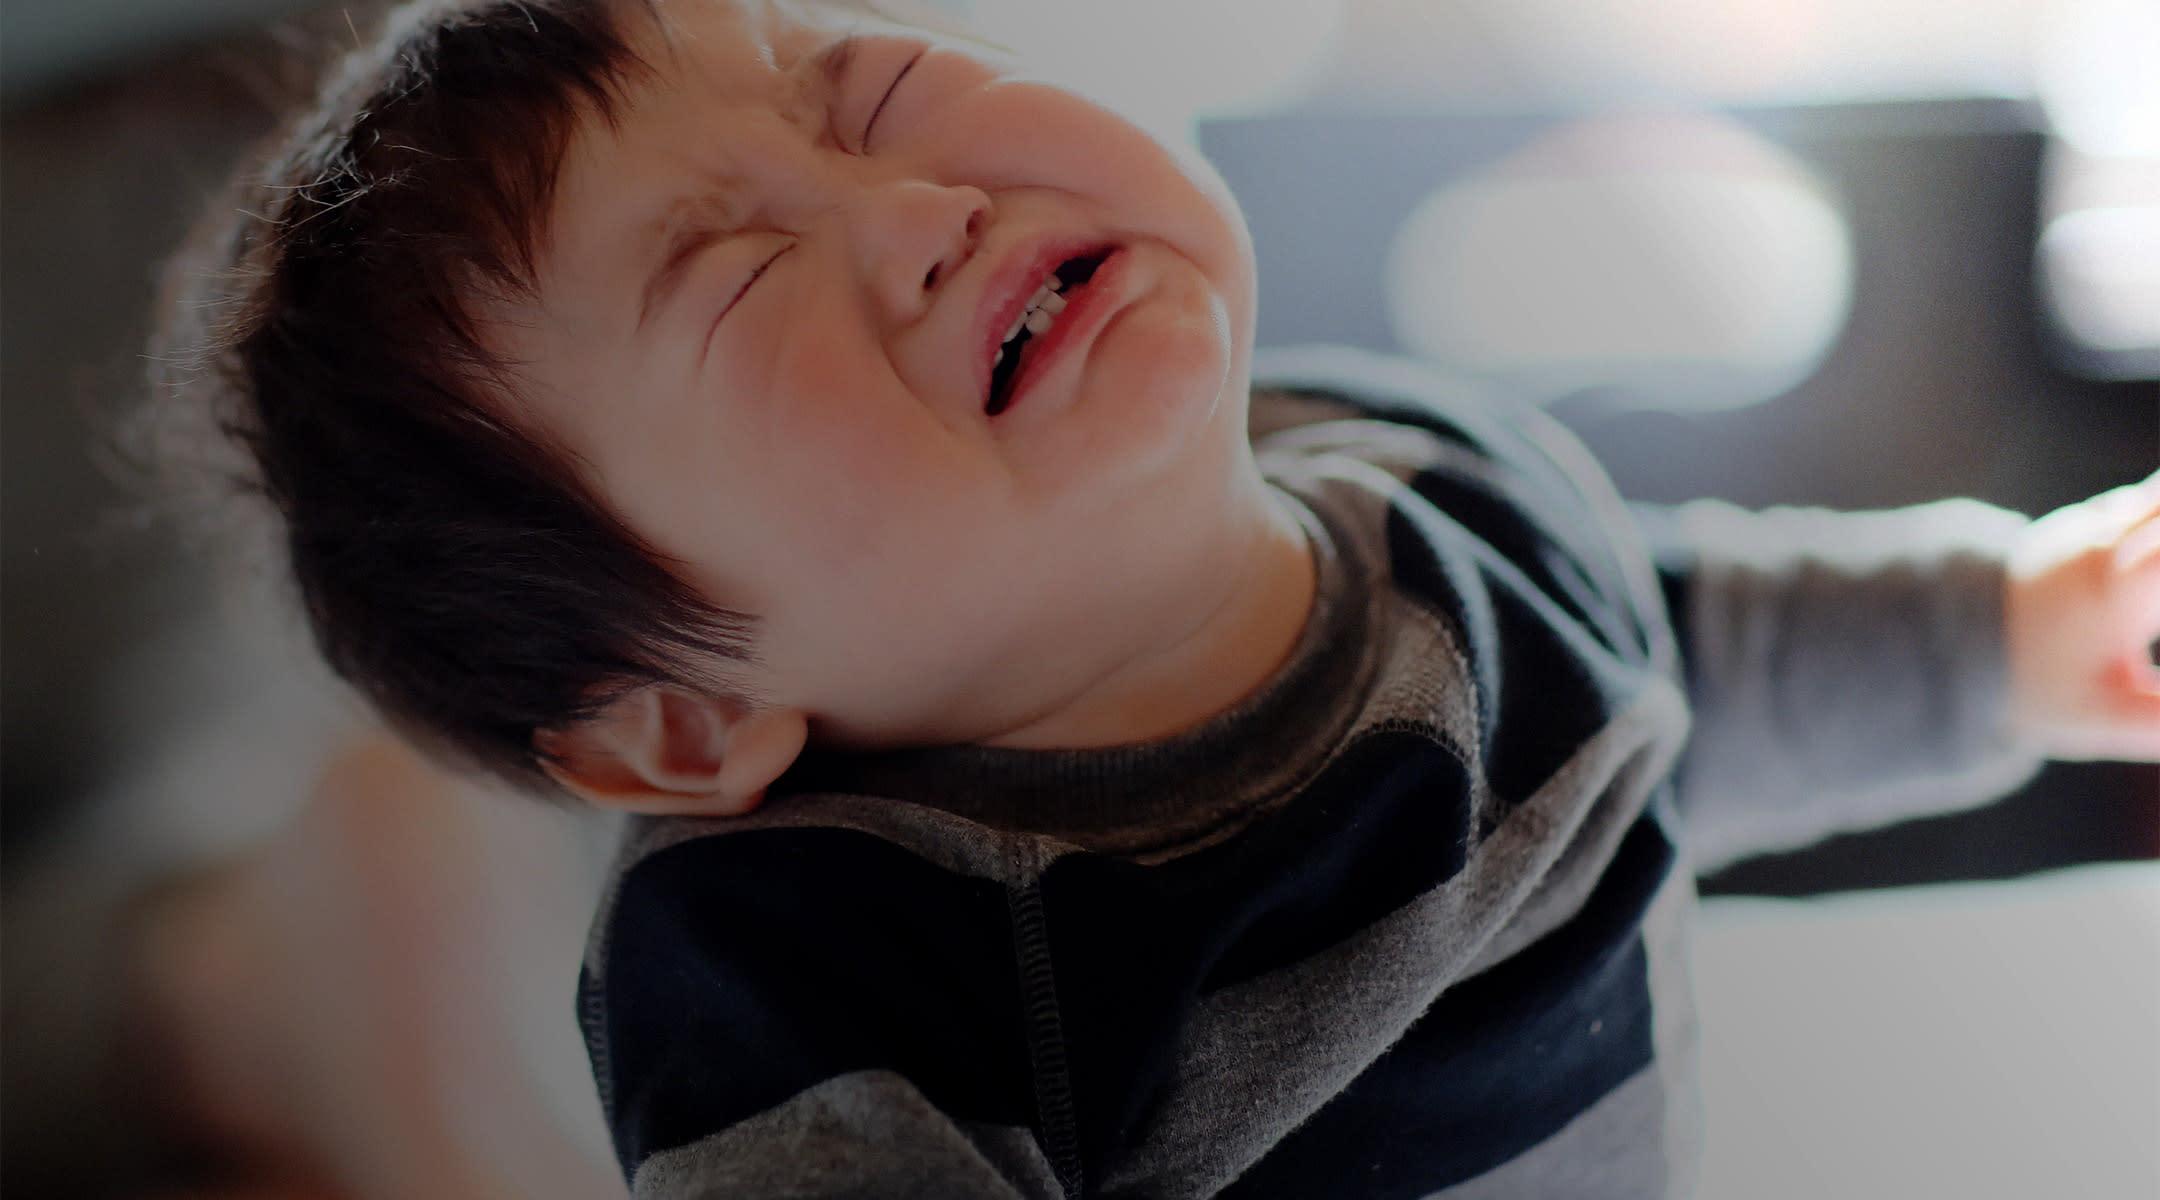 Child throwing a tantrum